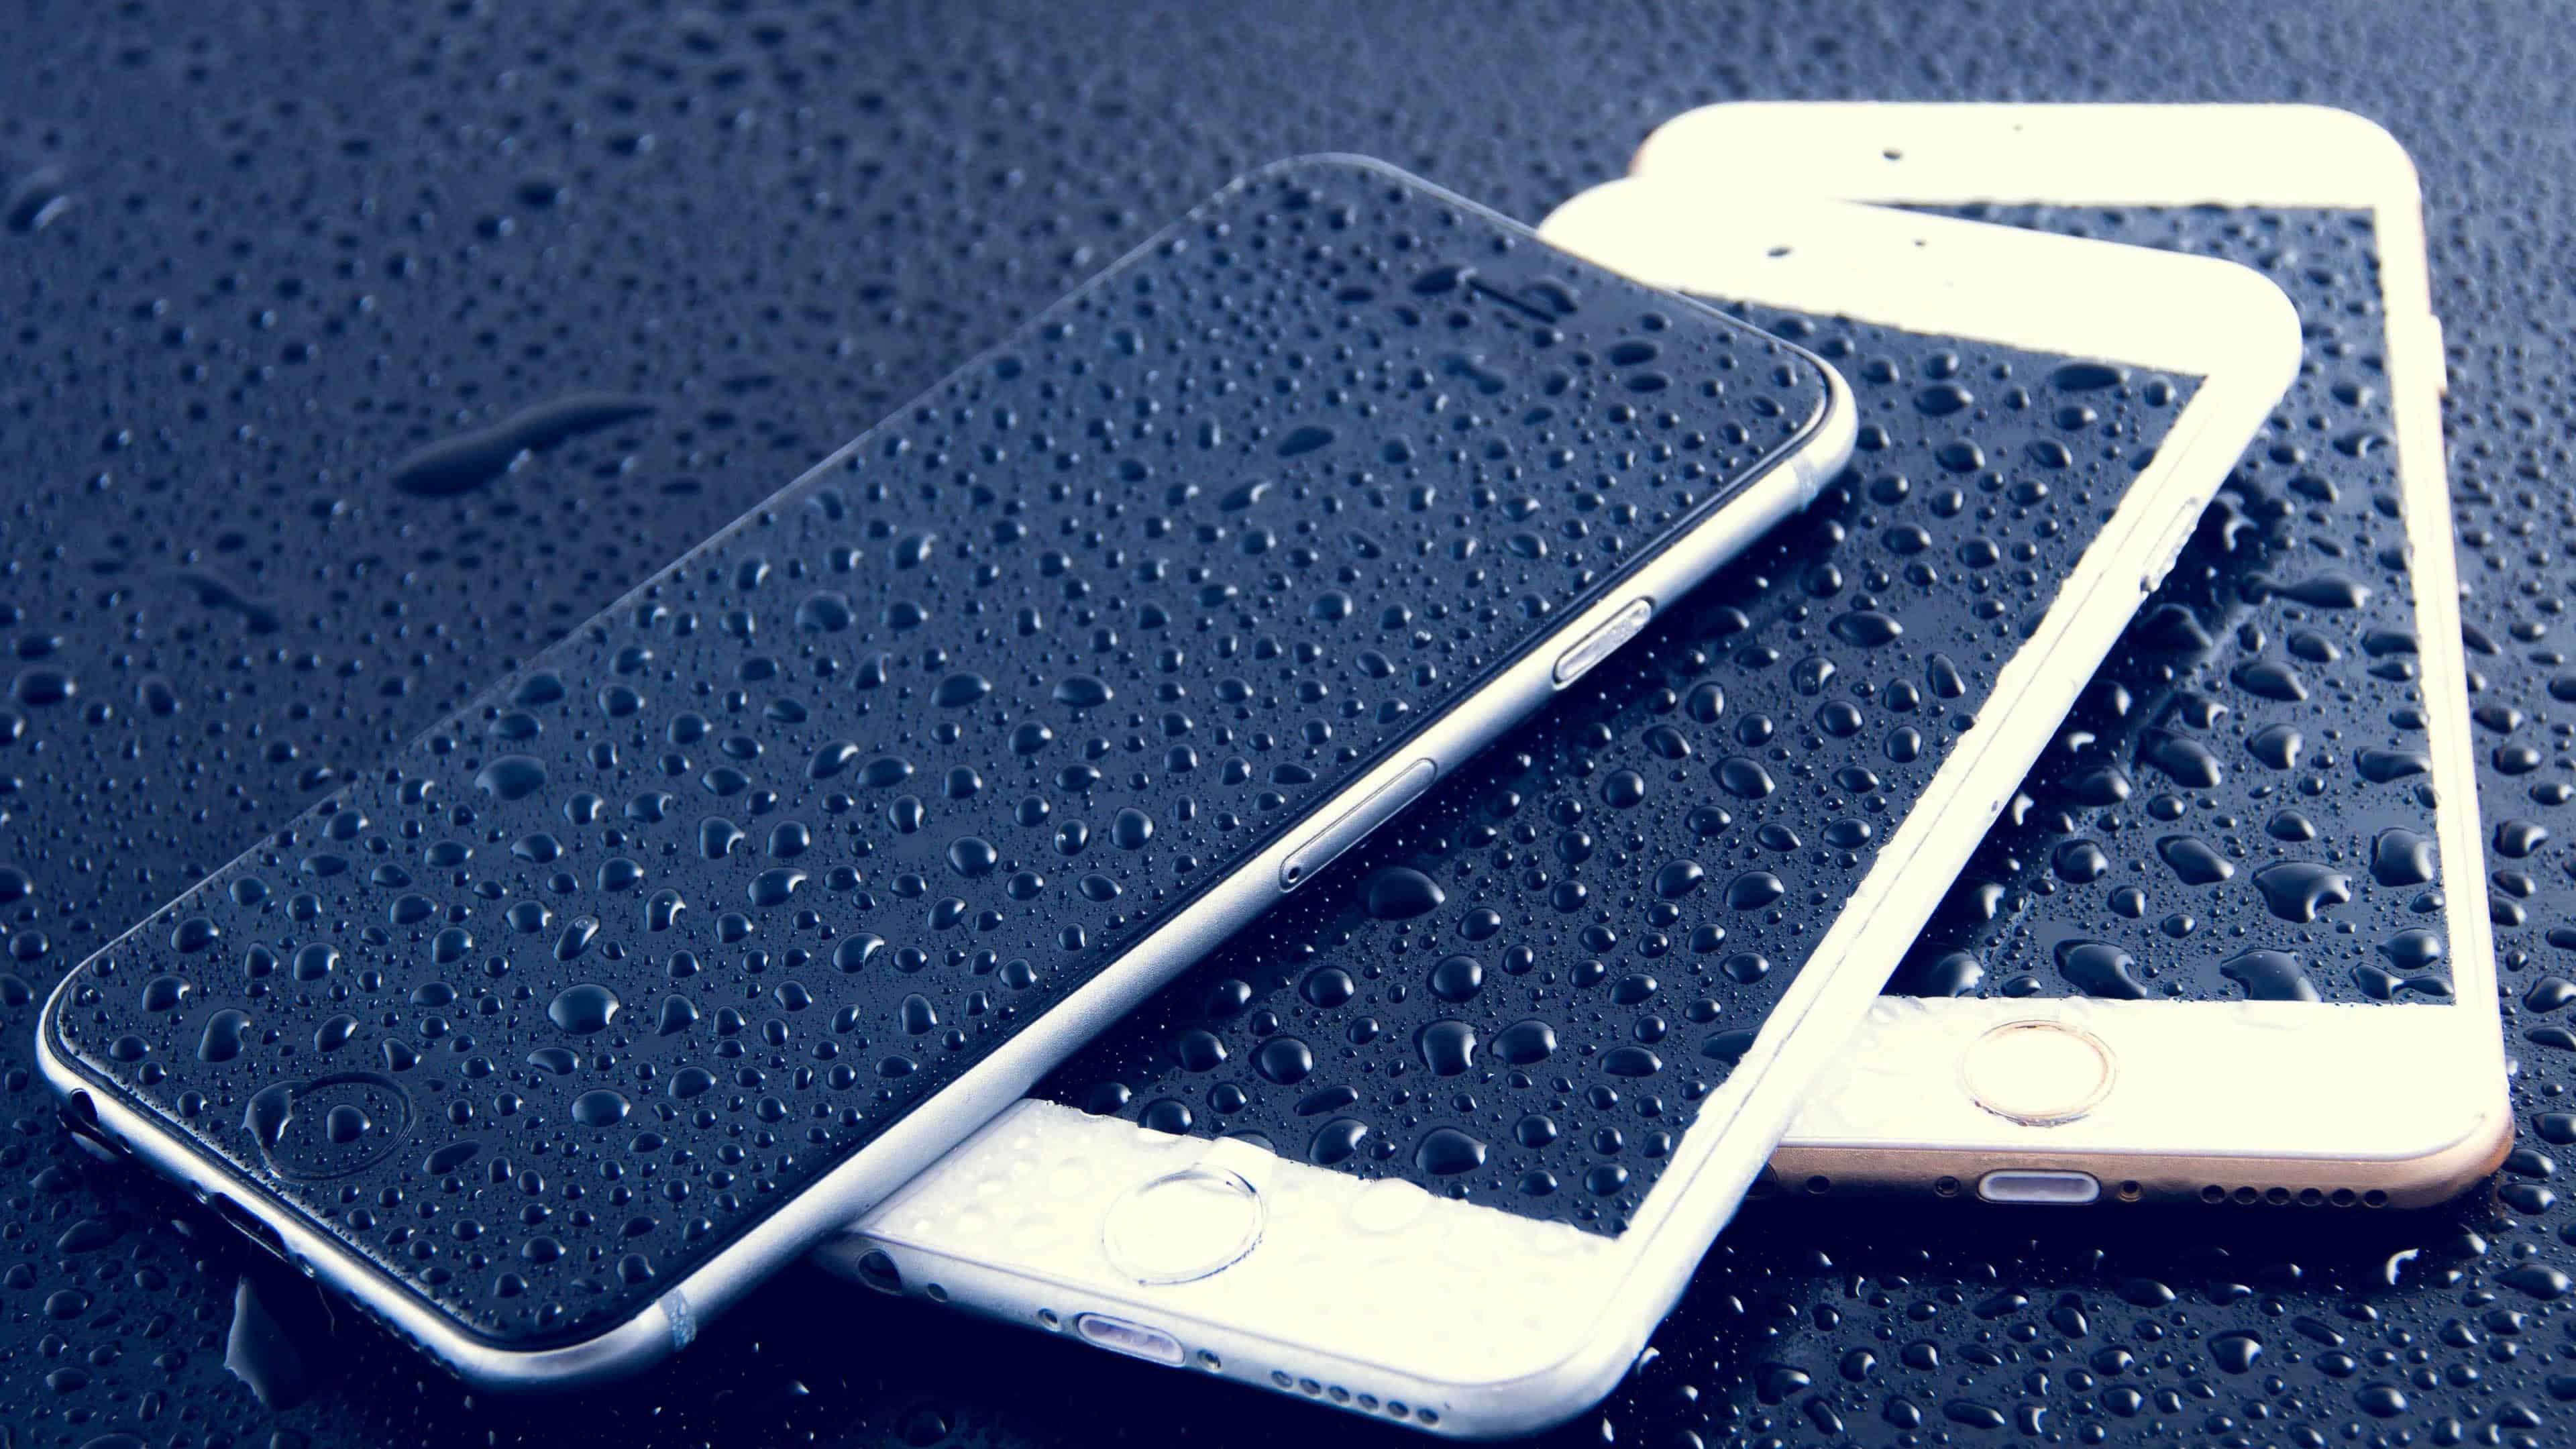 Apple Iphone 6s Waterproof Uhd 4k Wallpaper   Data - Ultra Hd Iphone Wallpaper For Pc - HD Wallpaper